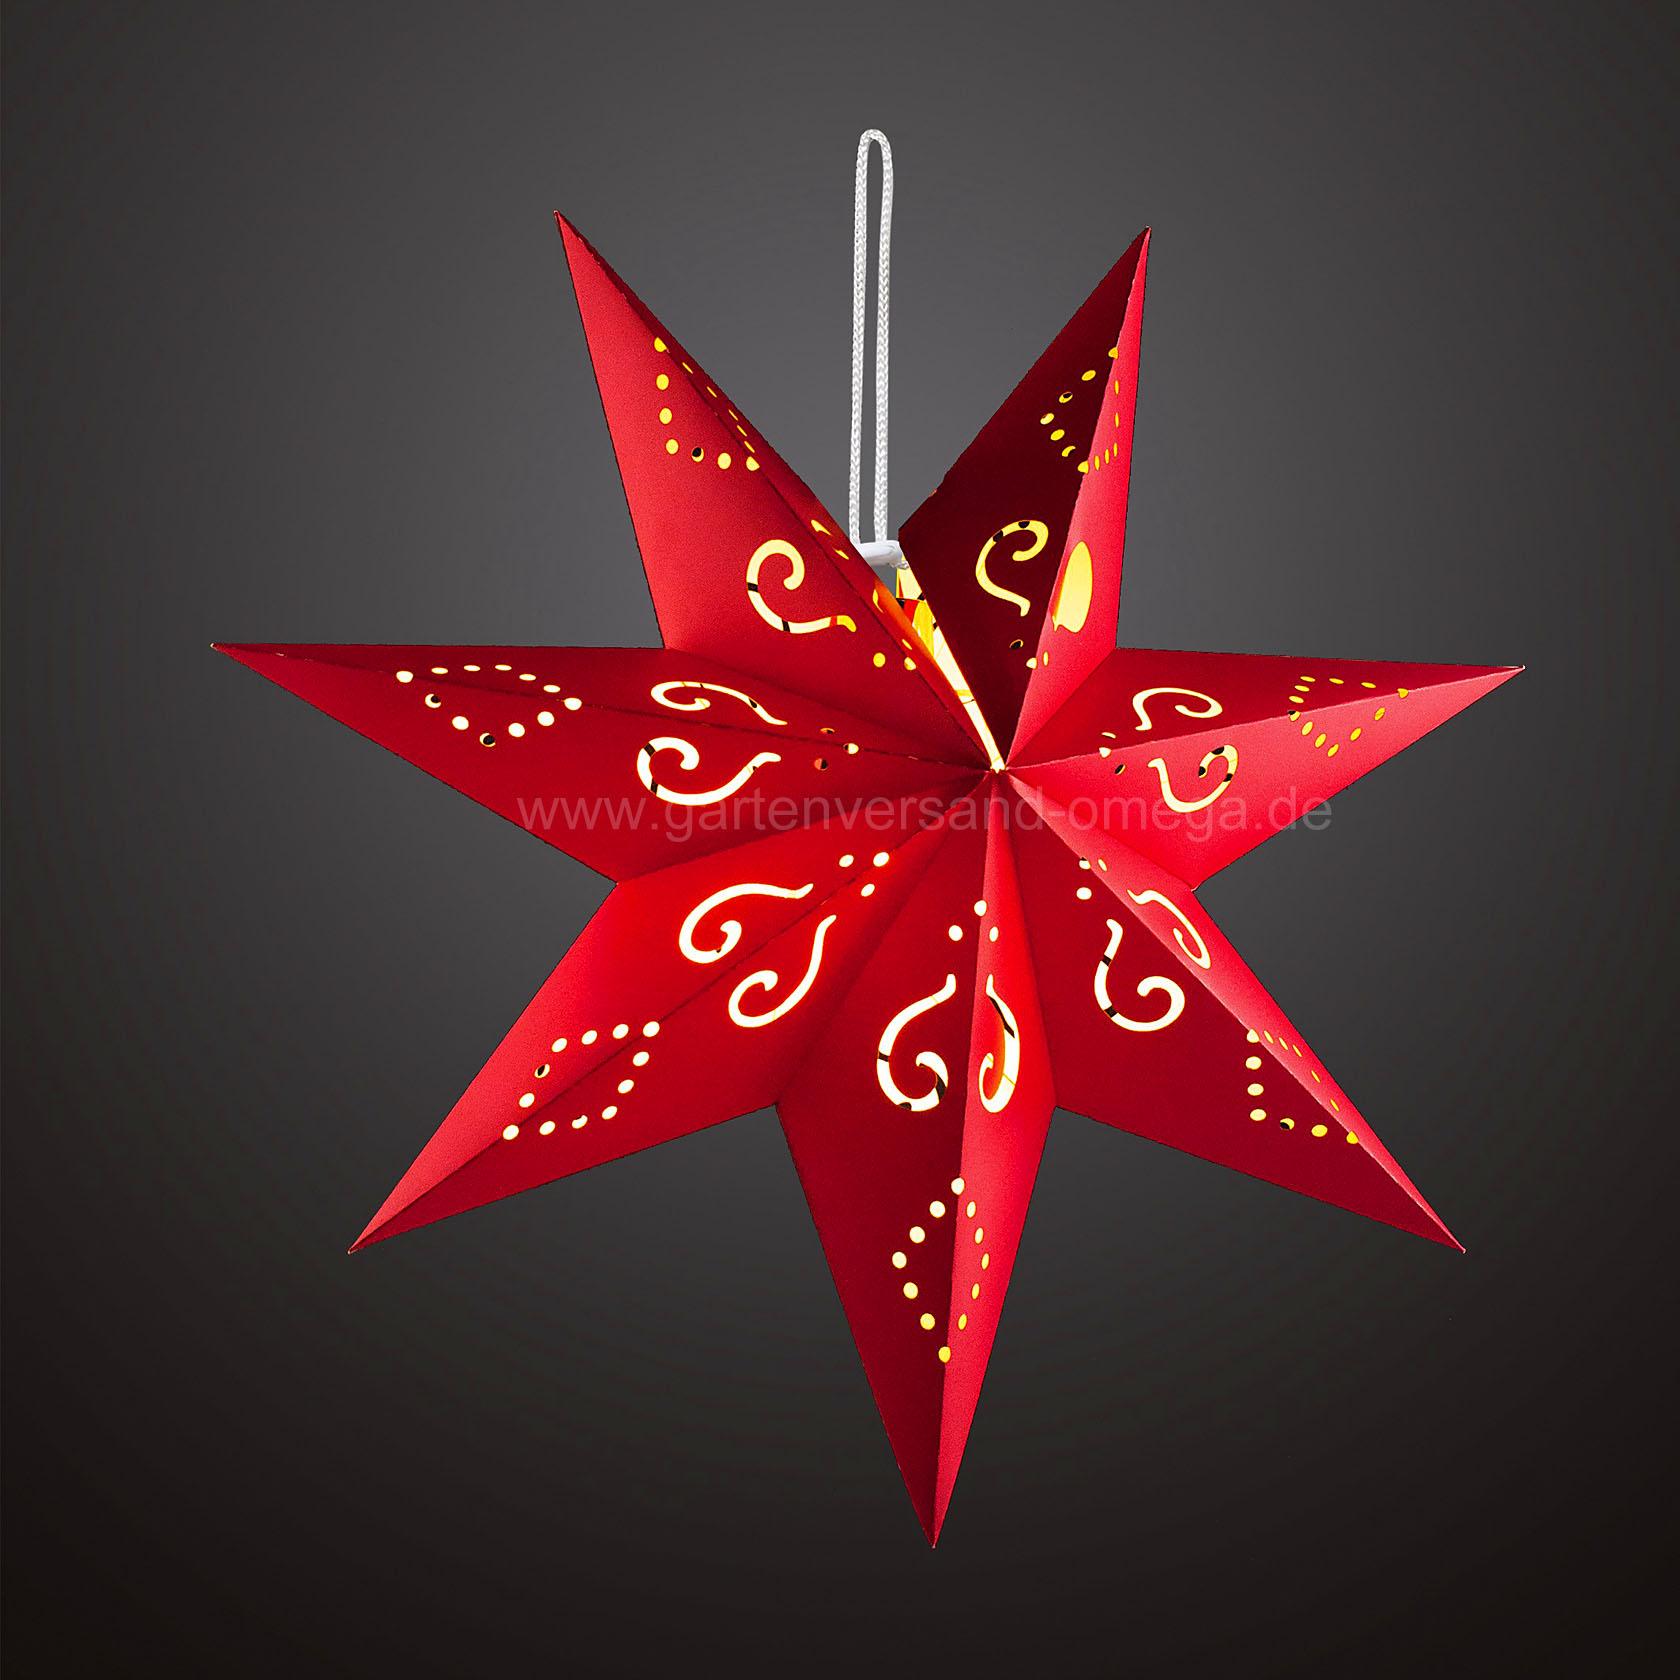 Batteriebetriebener led papierstern rot papierstern kabellos beleuchteter papierstern - Weihnachtsbeleuchtung kabellos ...